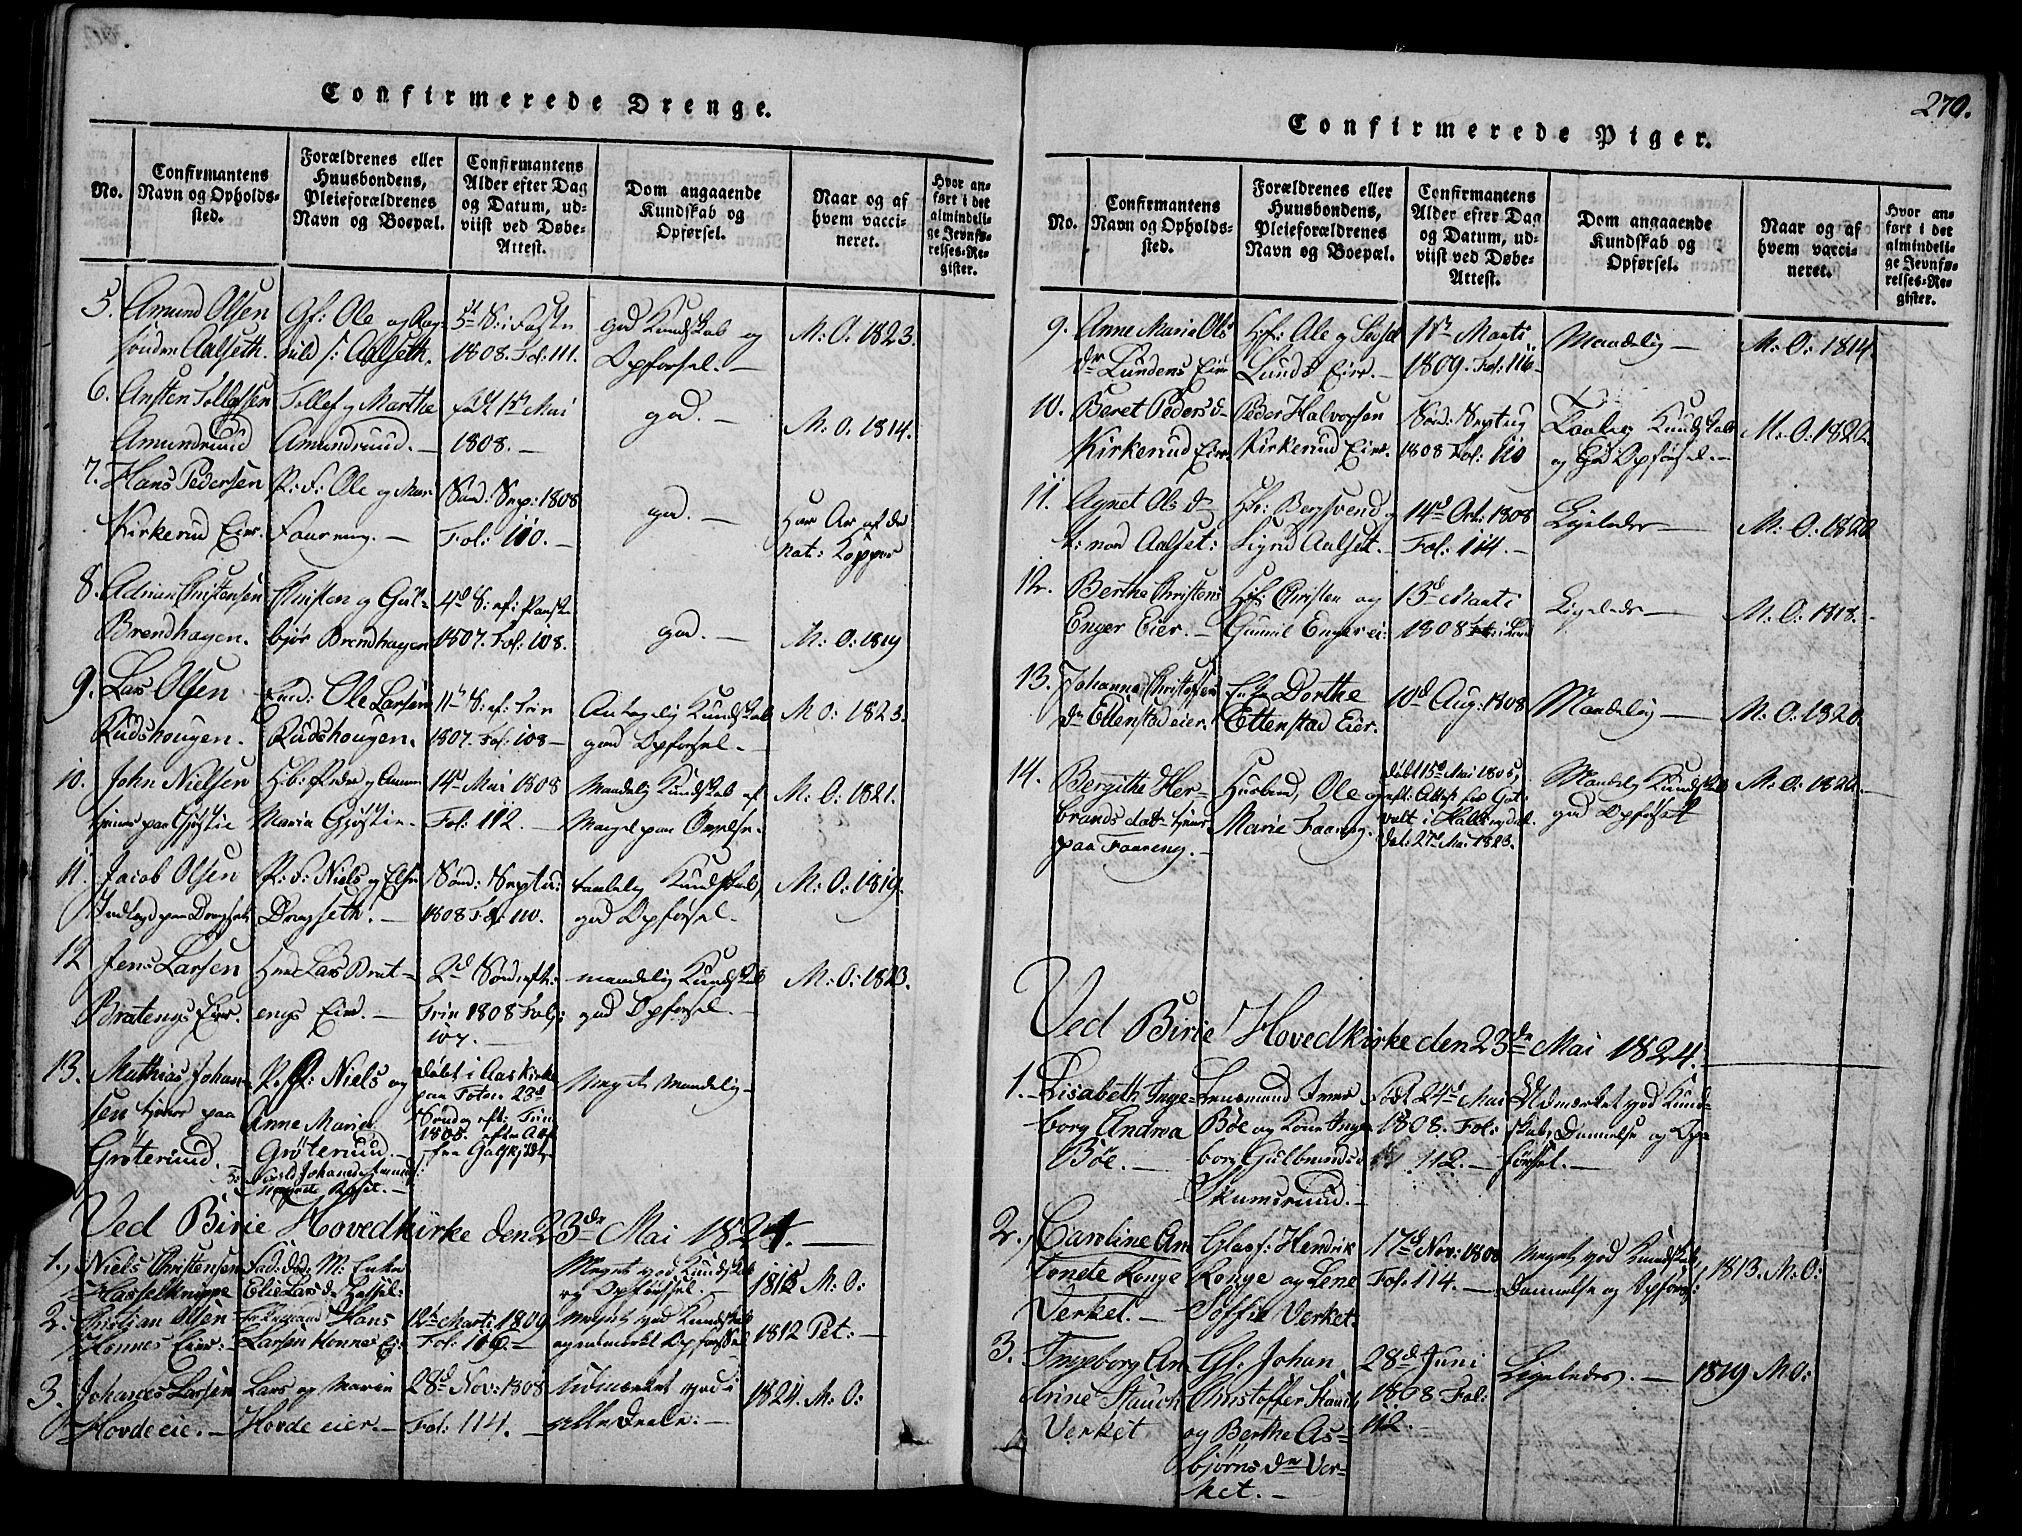 SAH, Biri prestekontor, Ministerialbok nr. 3, 1814-1828, s. 270